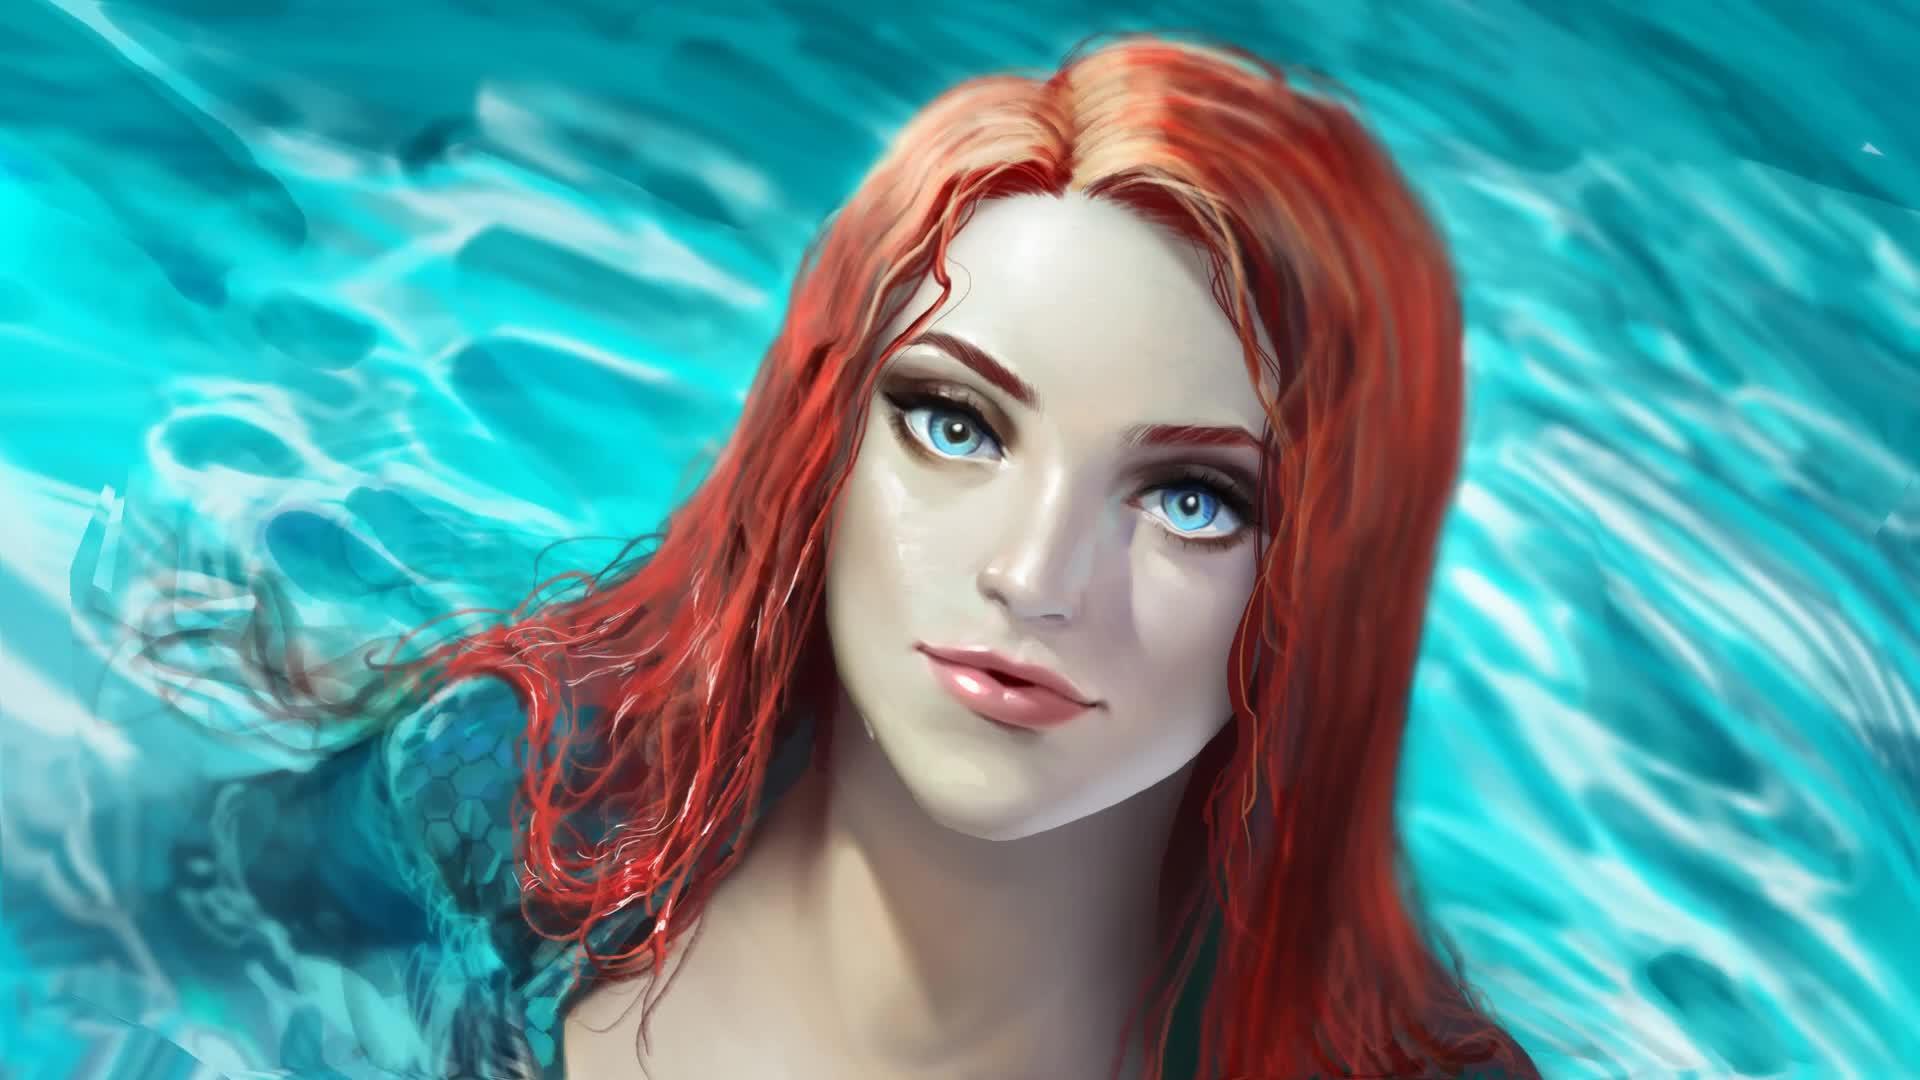 Women Redhead Blue Eyes Long Hair Wet Hair Aquaman Artwork Water Sea Mera Dc Comics Fan Art Cyan 1920x1080 Wallpaper Wallhaven Cc